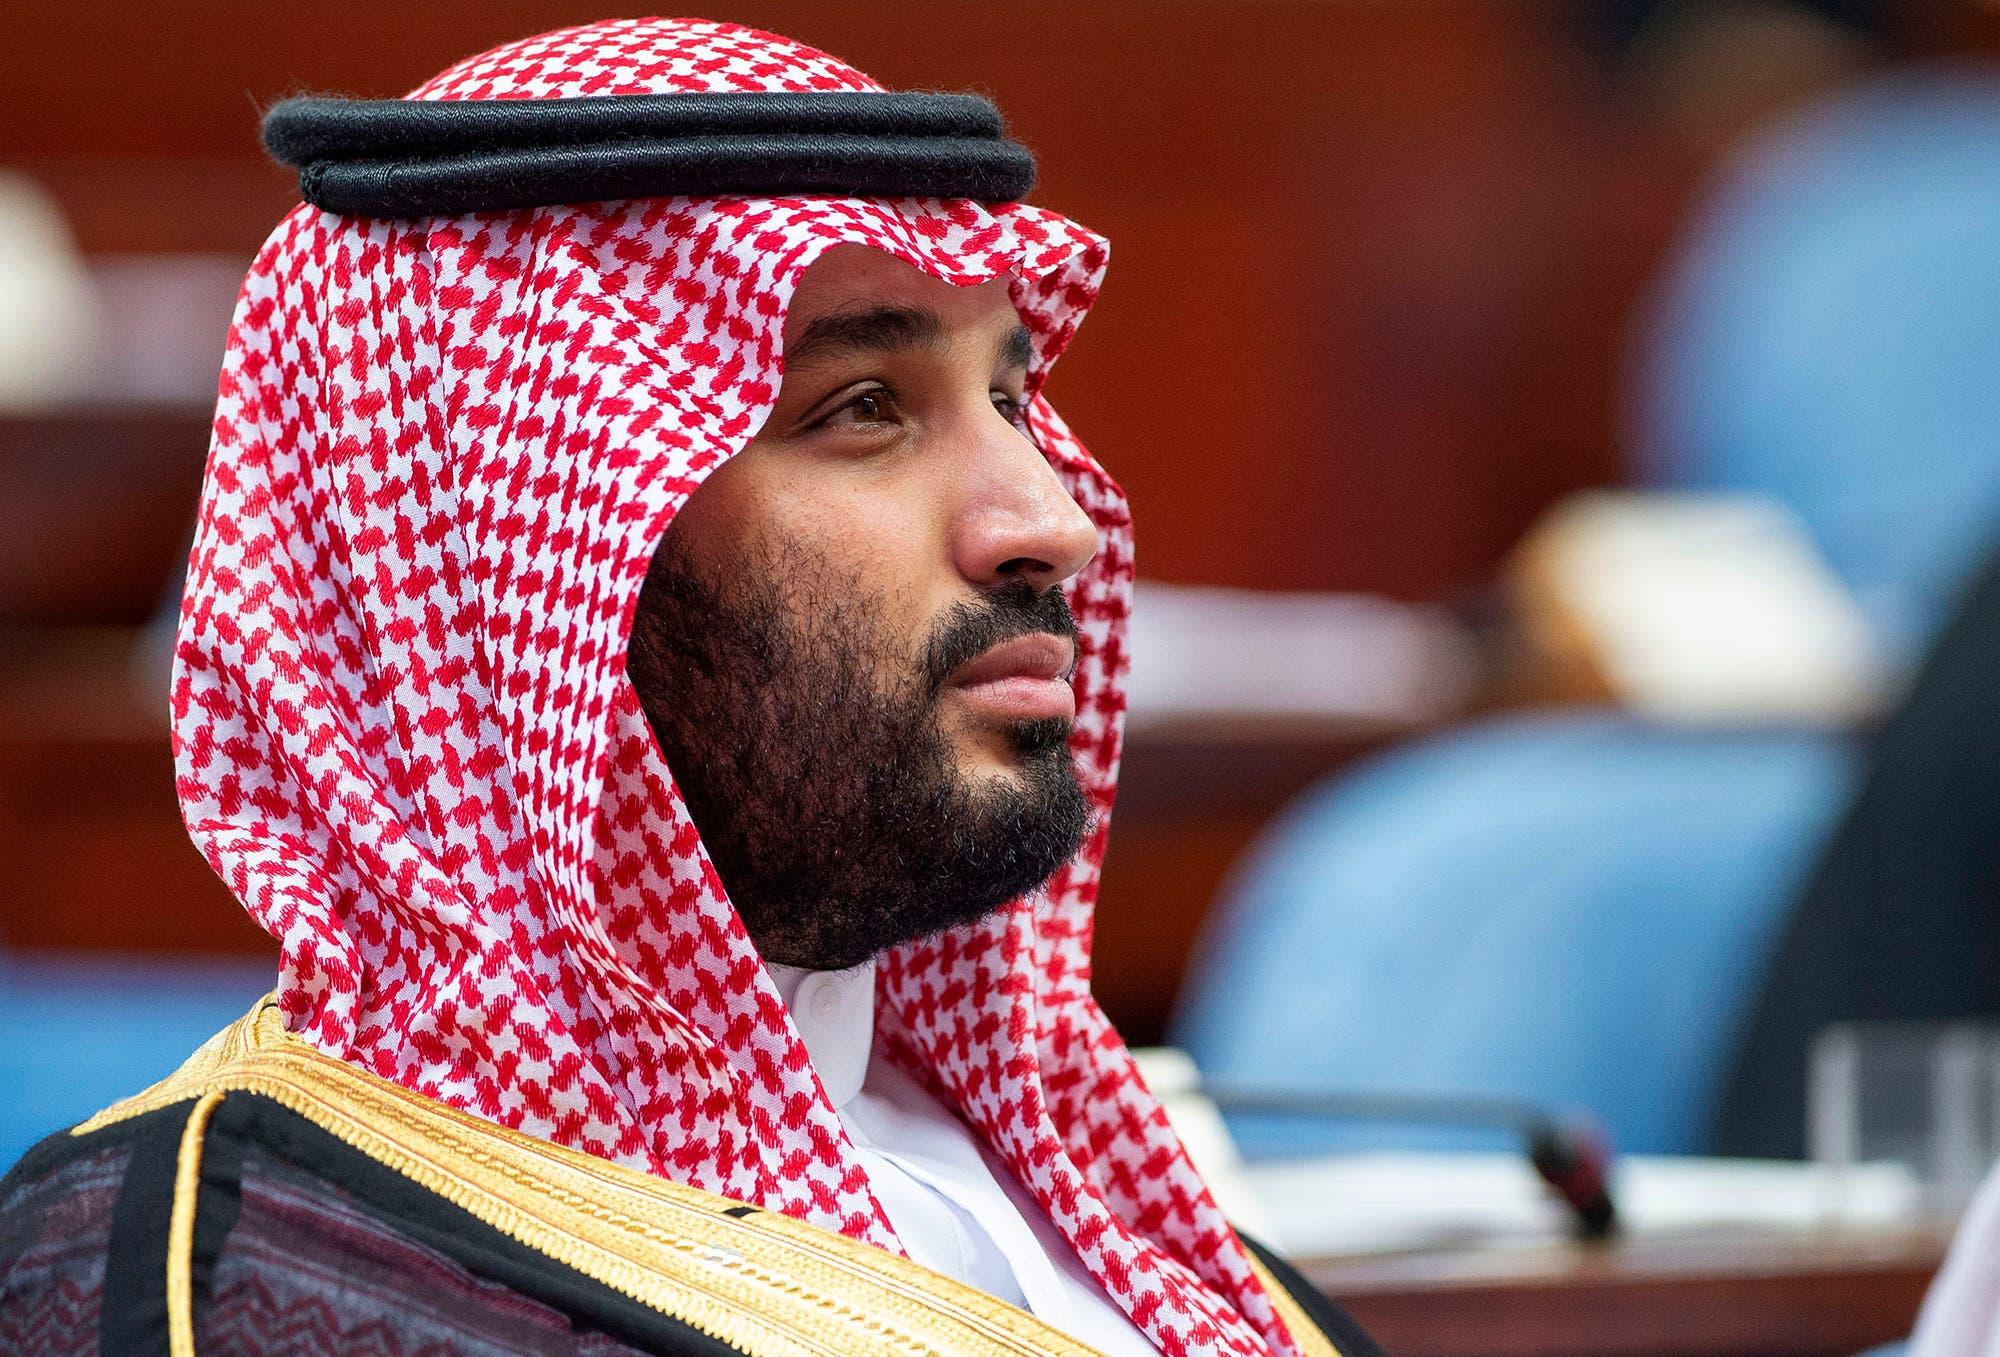 Saudi Arabia's Crown Prince Mohammed bin Salman. (File photo)